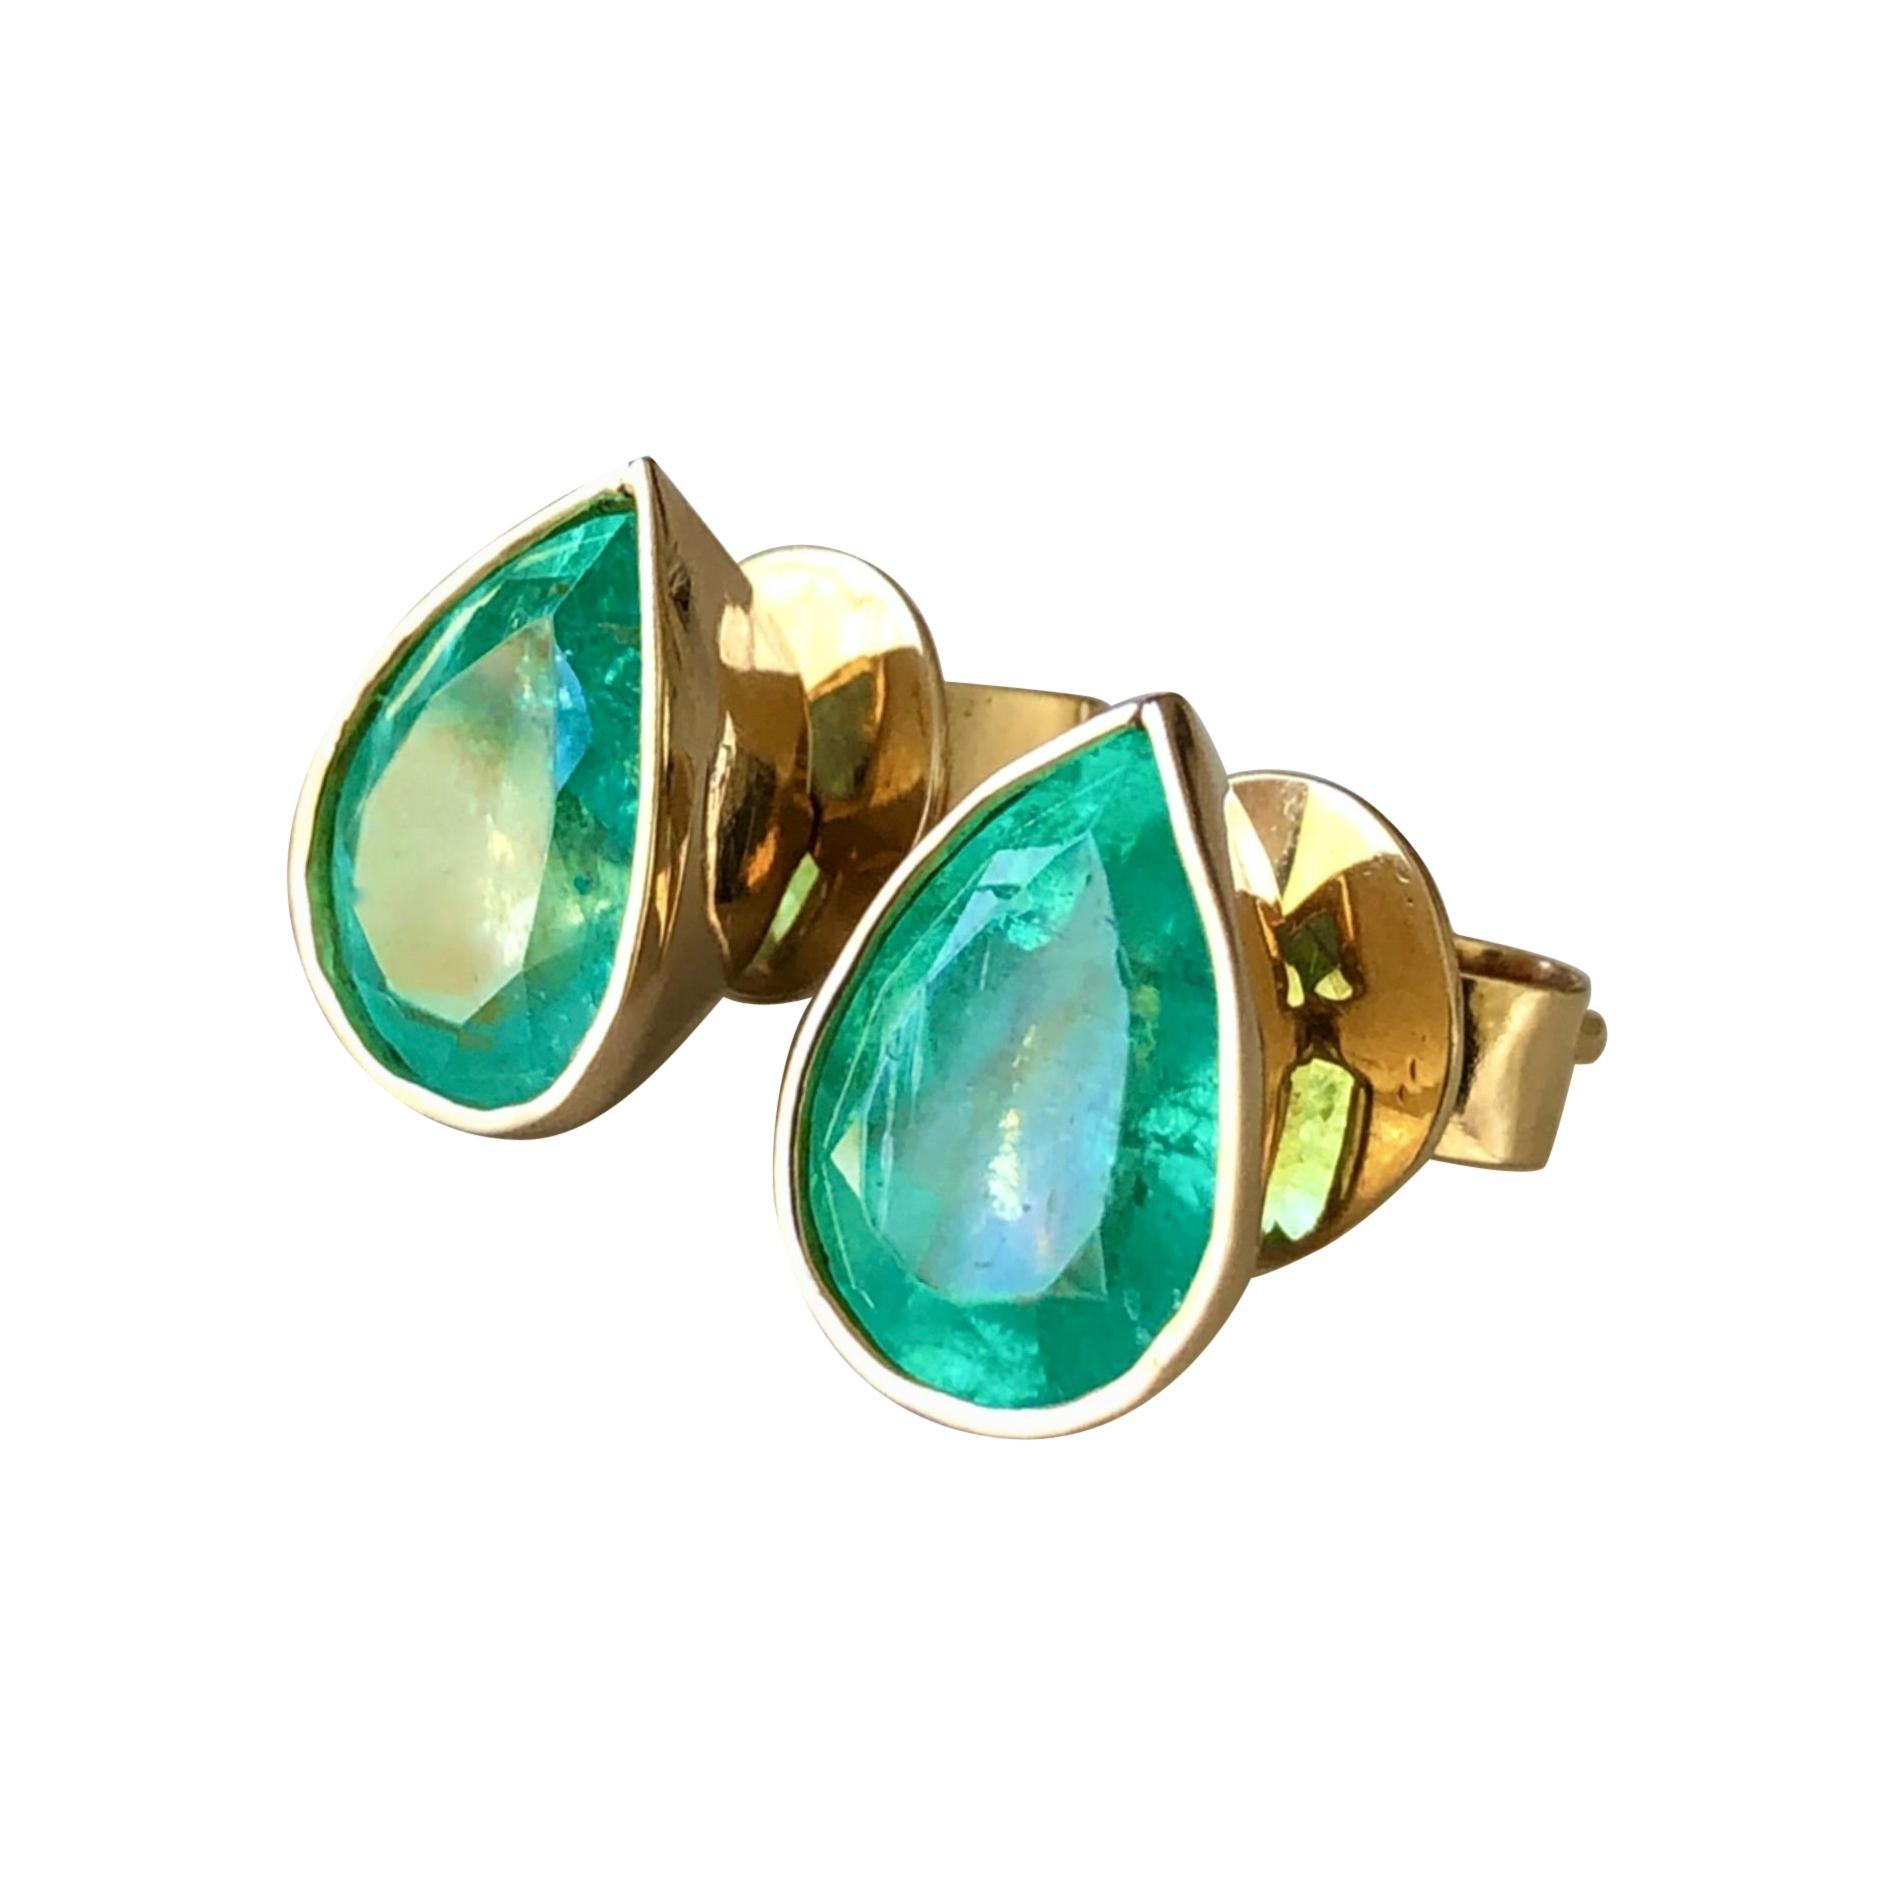 2.40 Carat Natural Colombian Emerald Pear Cut Studs Earrings 18k Gold